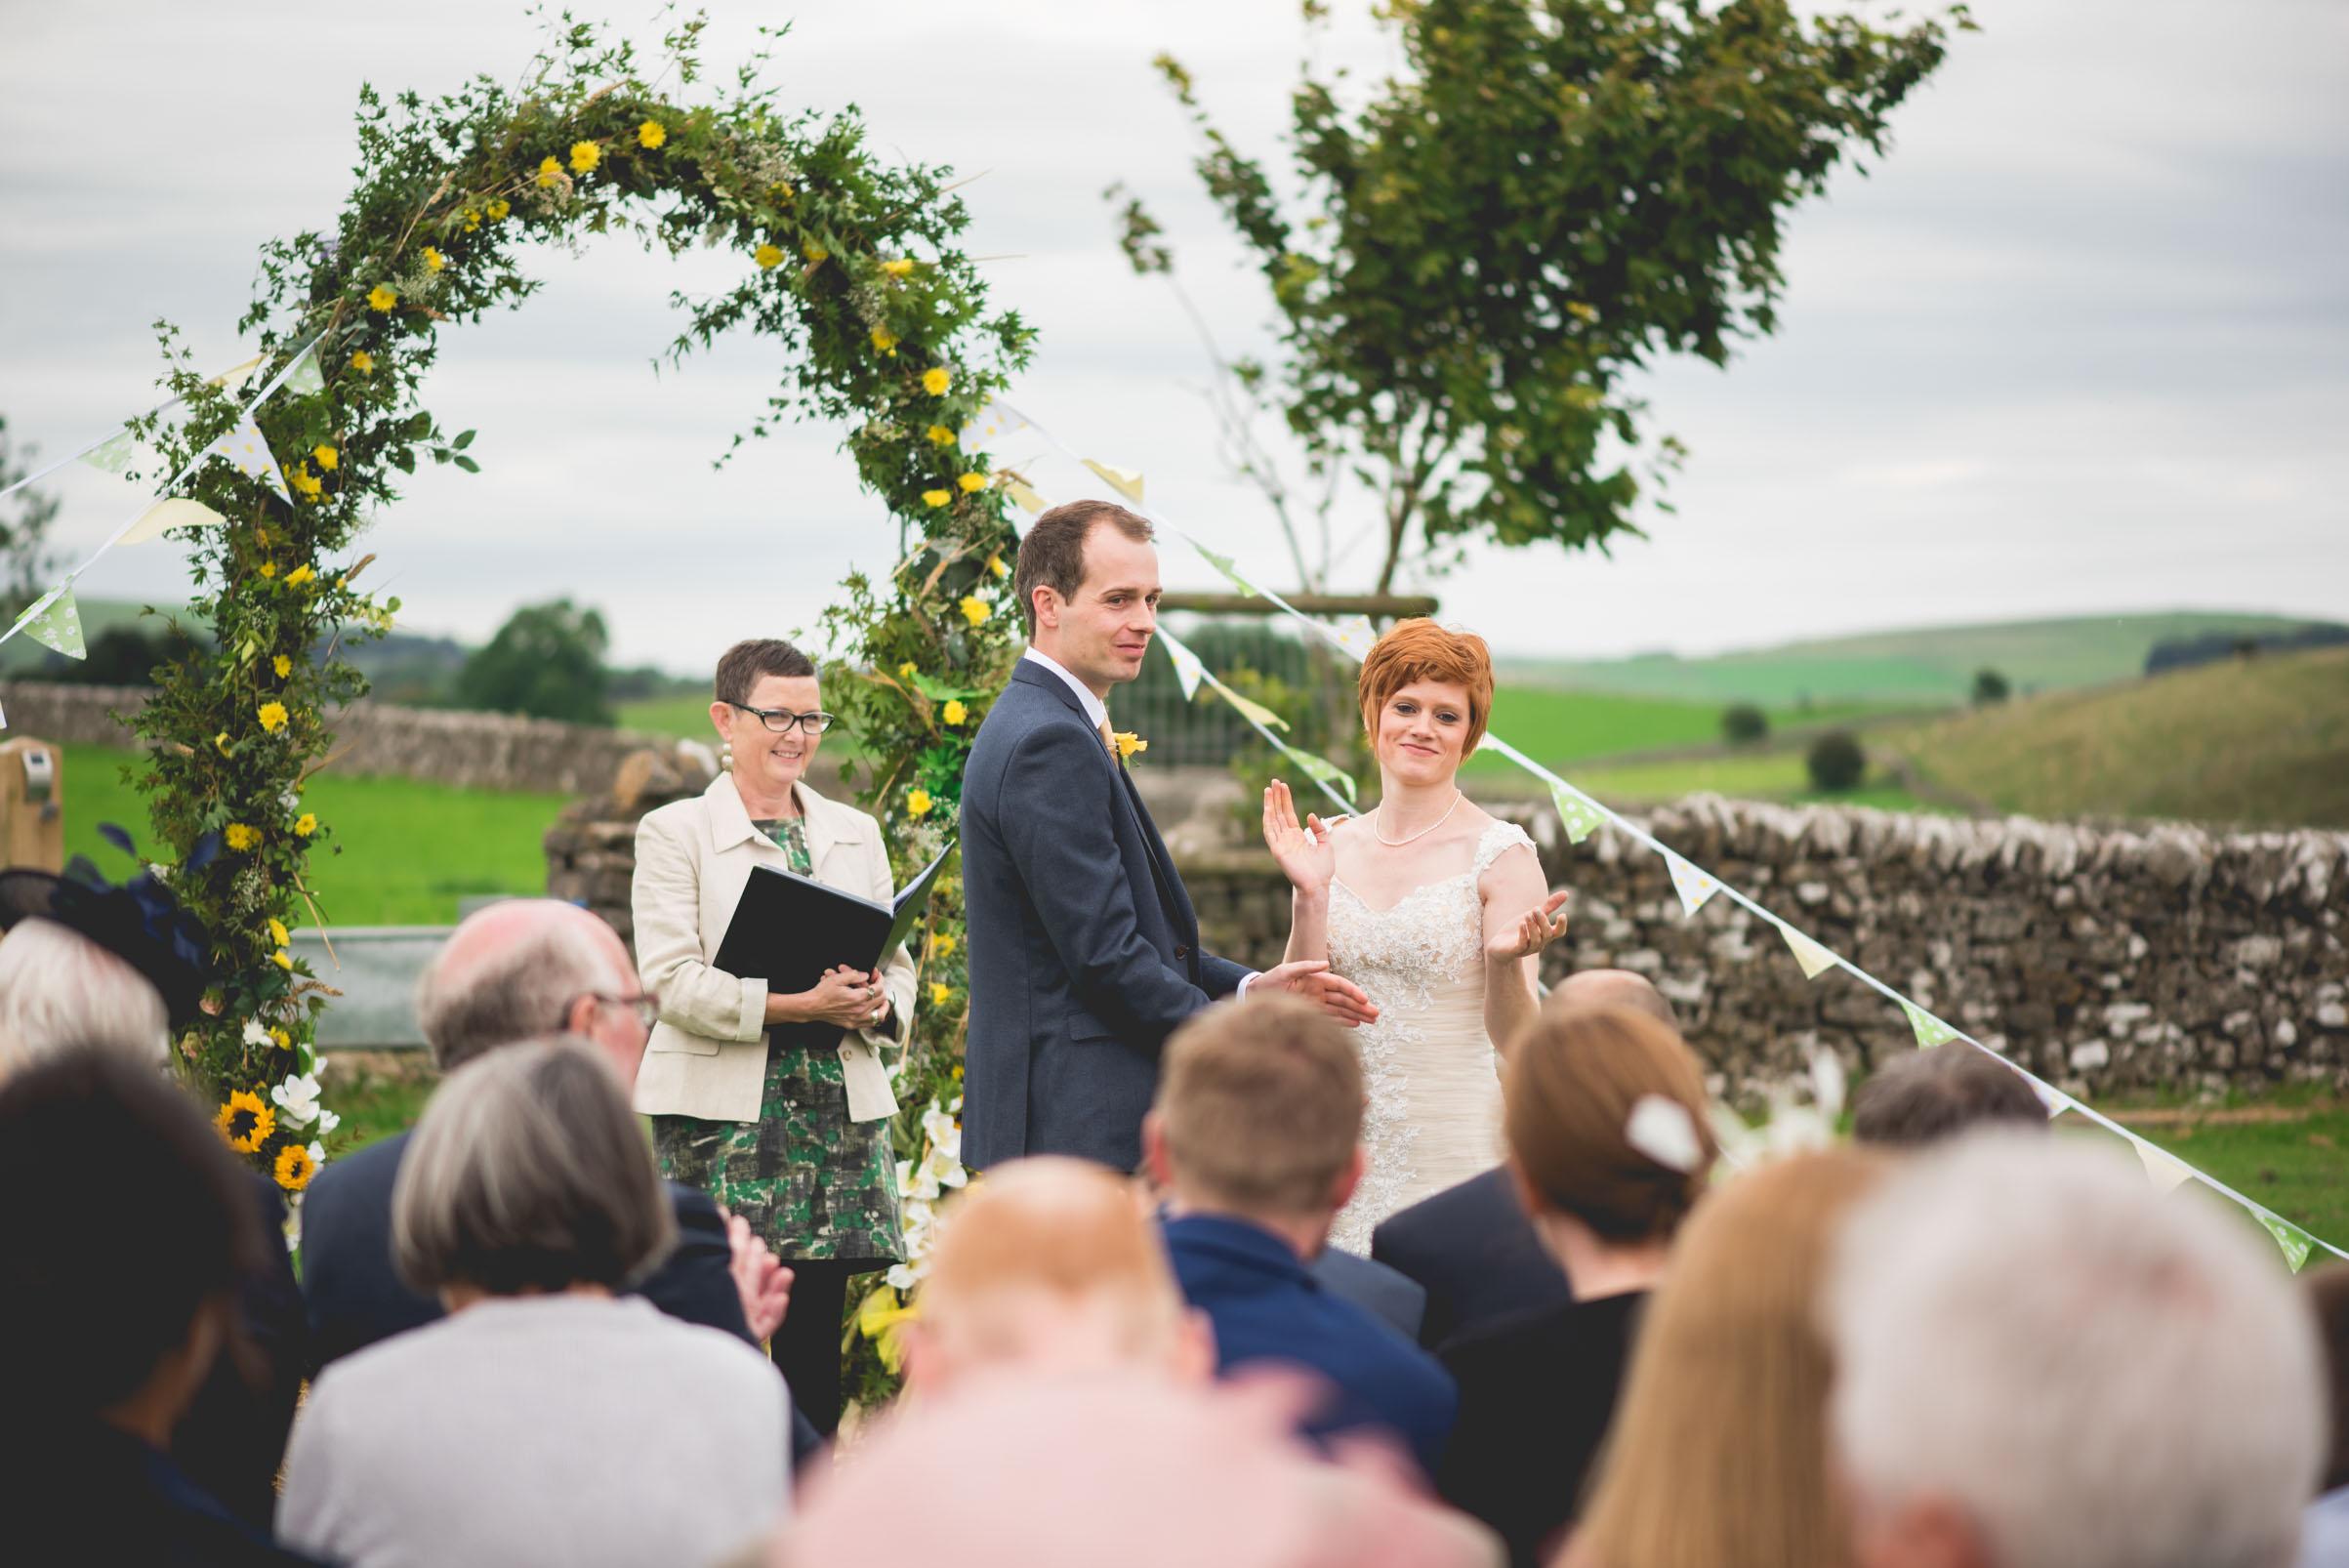 Peak+district+farm+wedding+lower+damgate+photographer-134.jpg